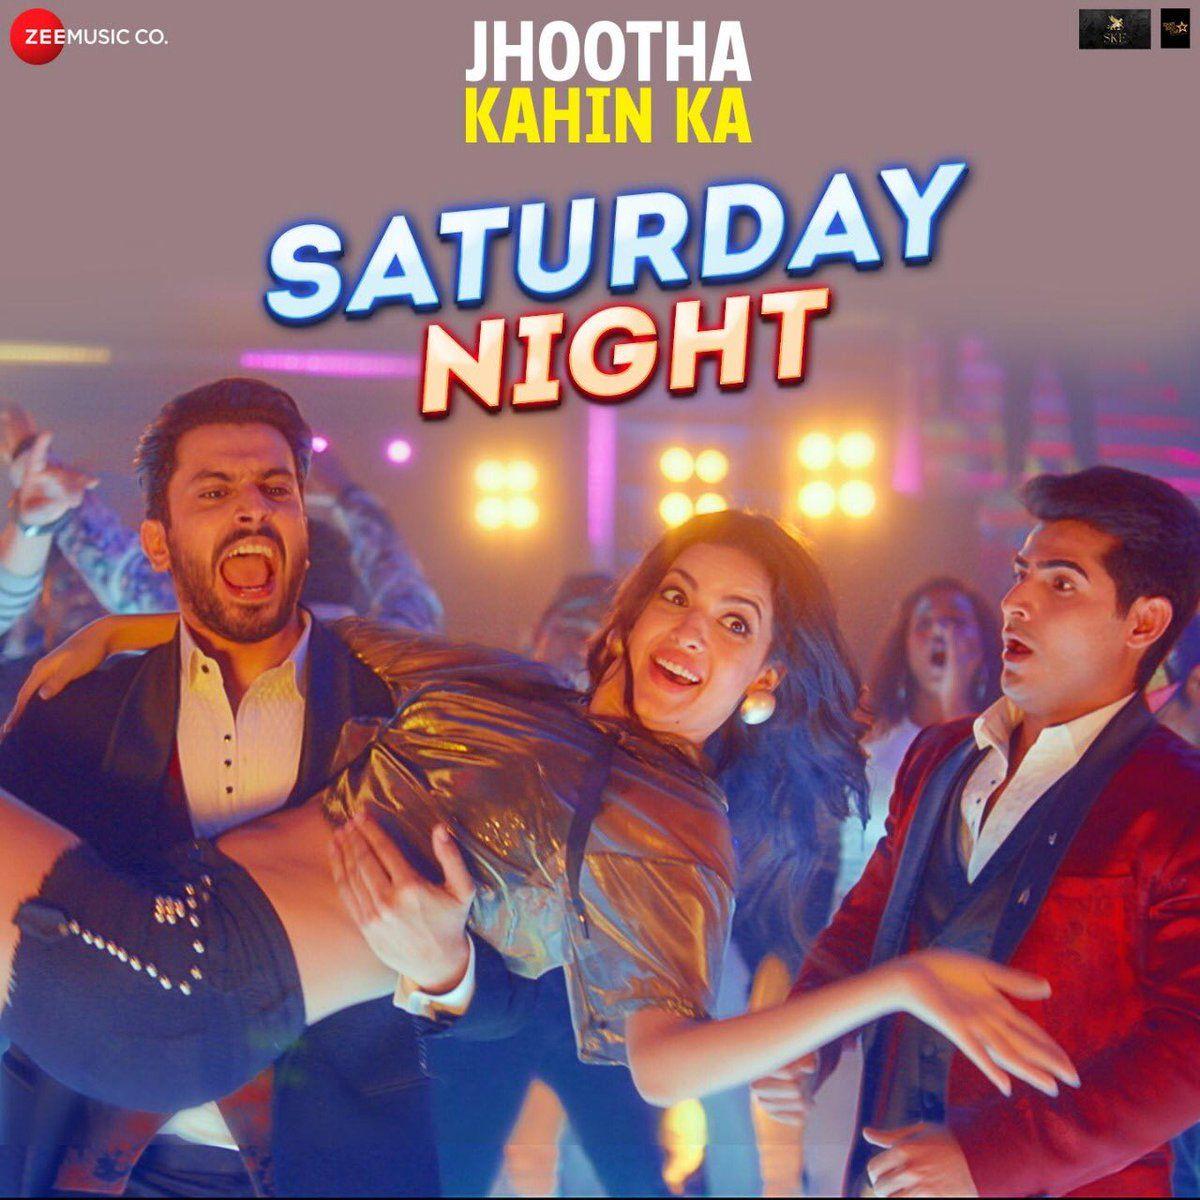 New song Saturday Night from the movie Jhootha Kahin Ka